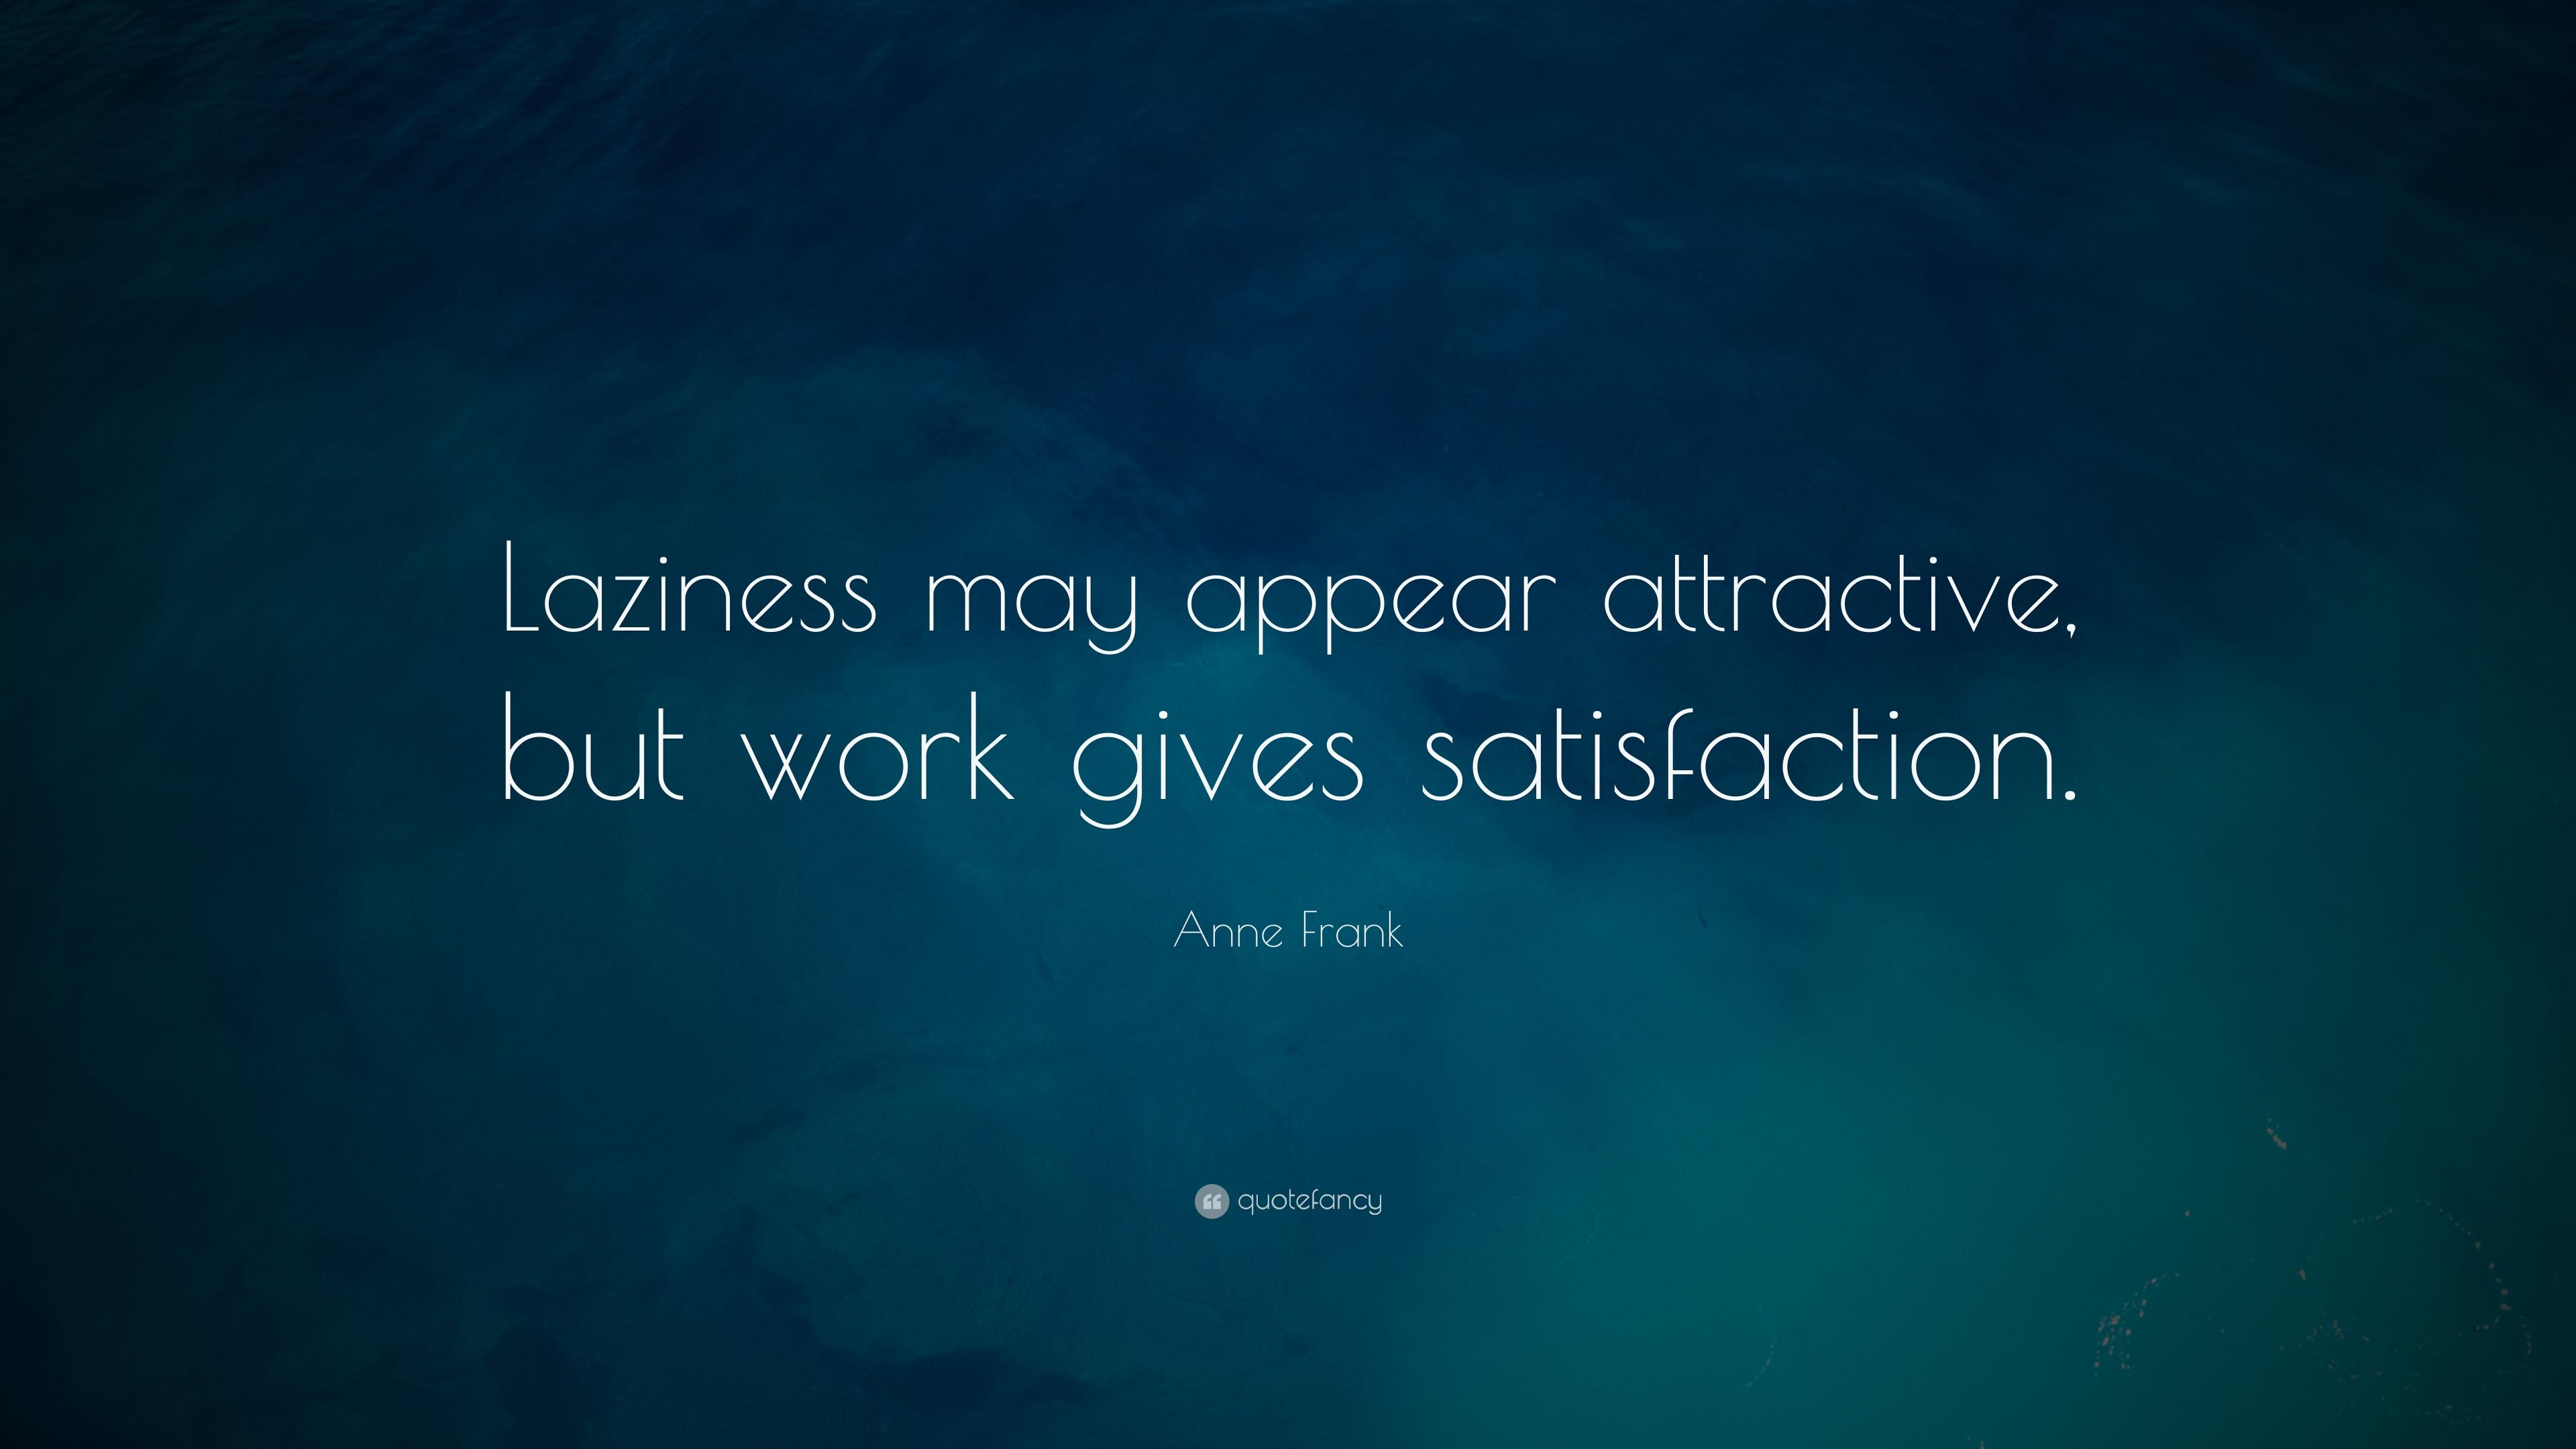 Quotes about work 40 wallpapers quotefancy 40 wallpapers altavistaventures Gallery